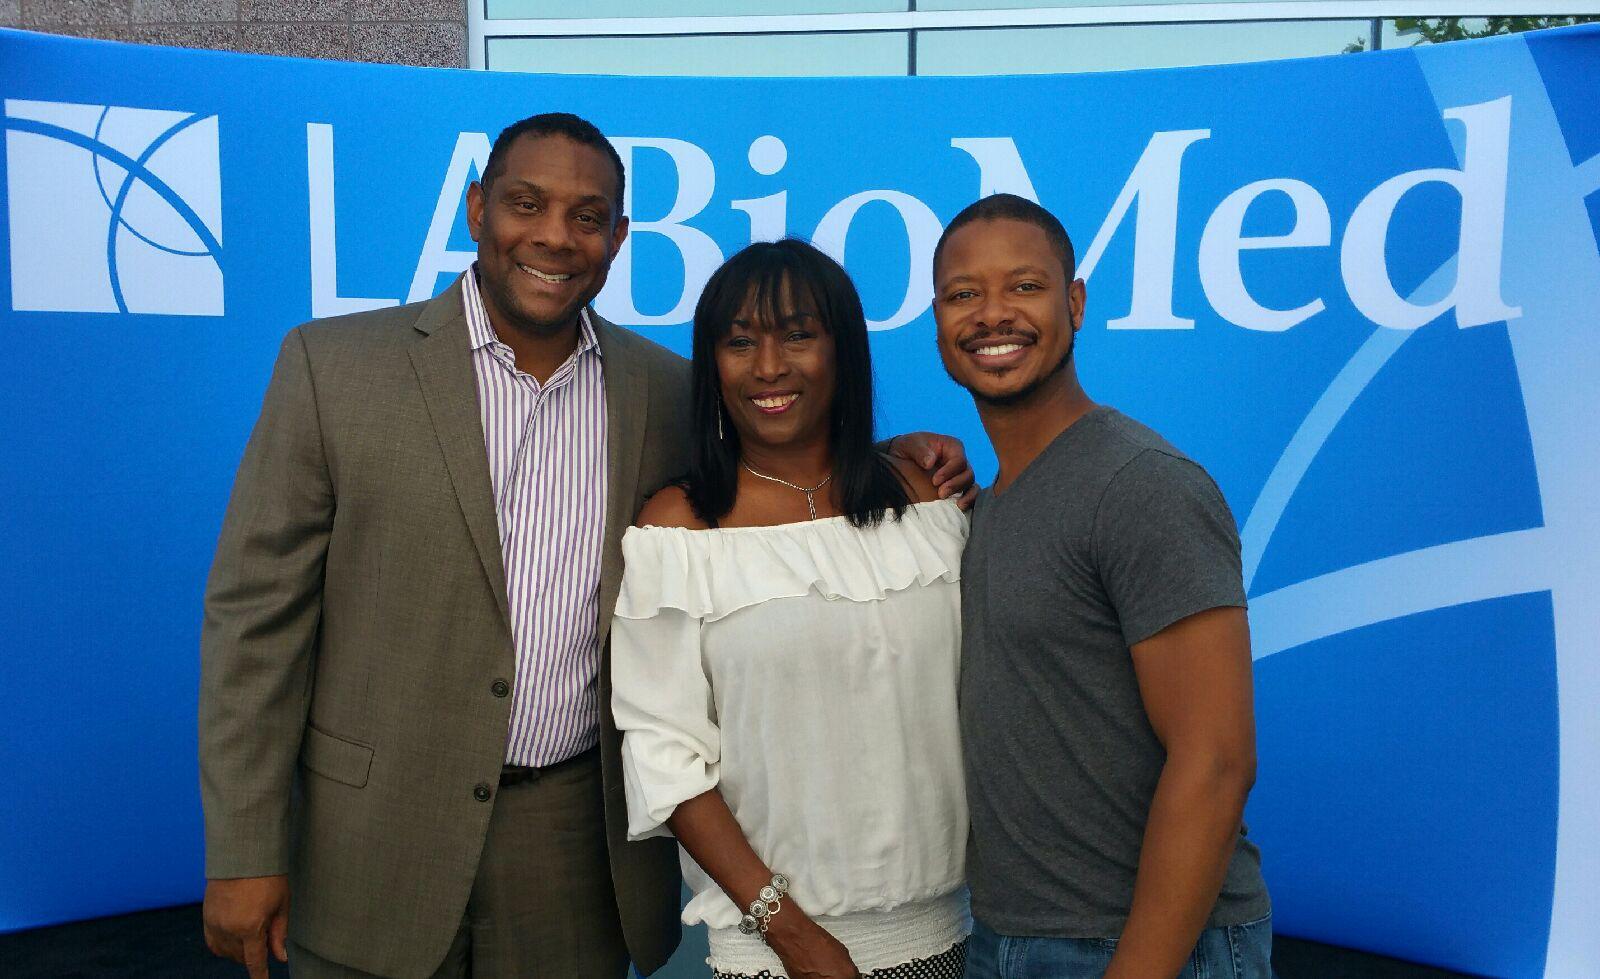 Andre Dawson, KiKi Shepard, and Arjay Smith at Endari Celebration.